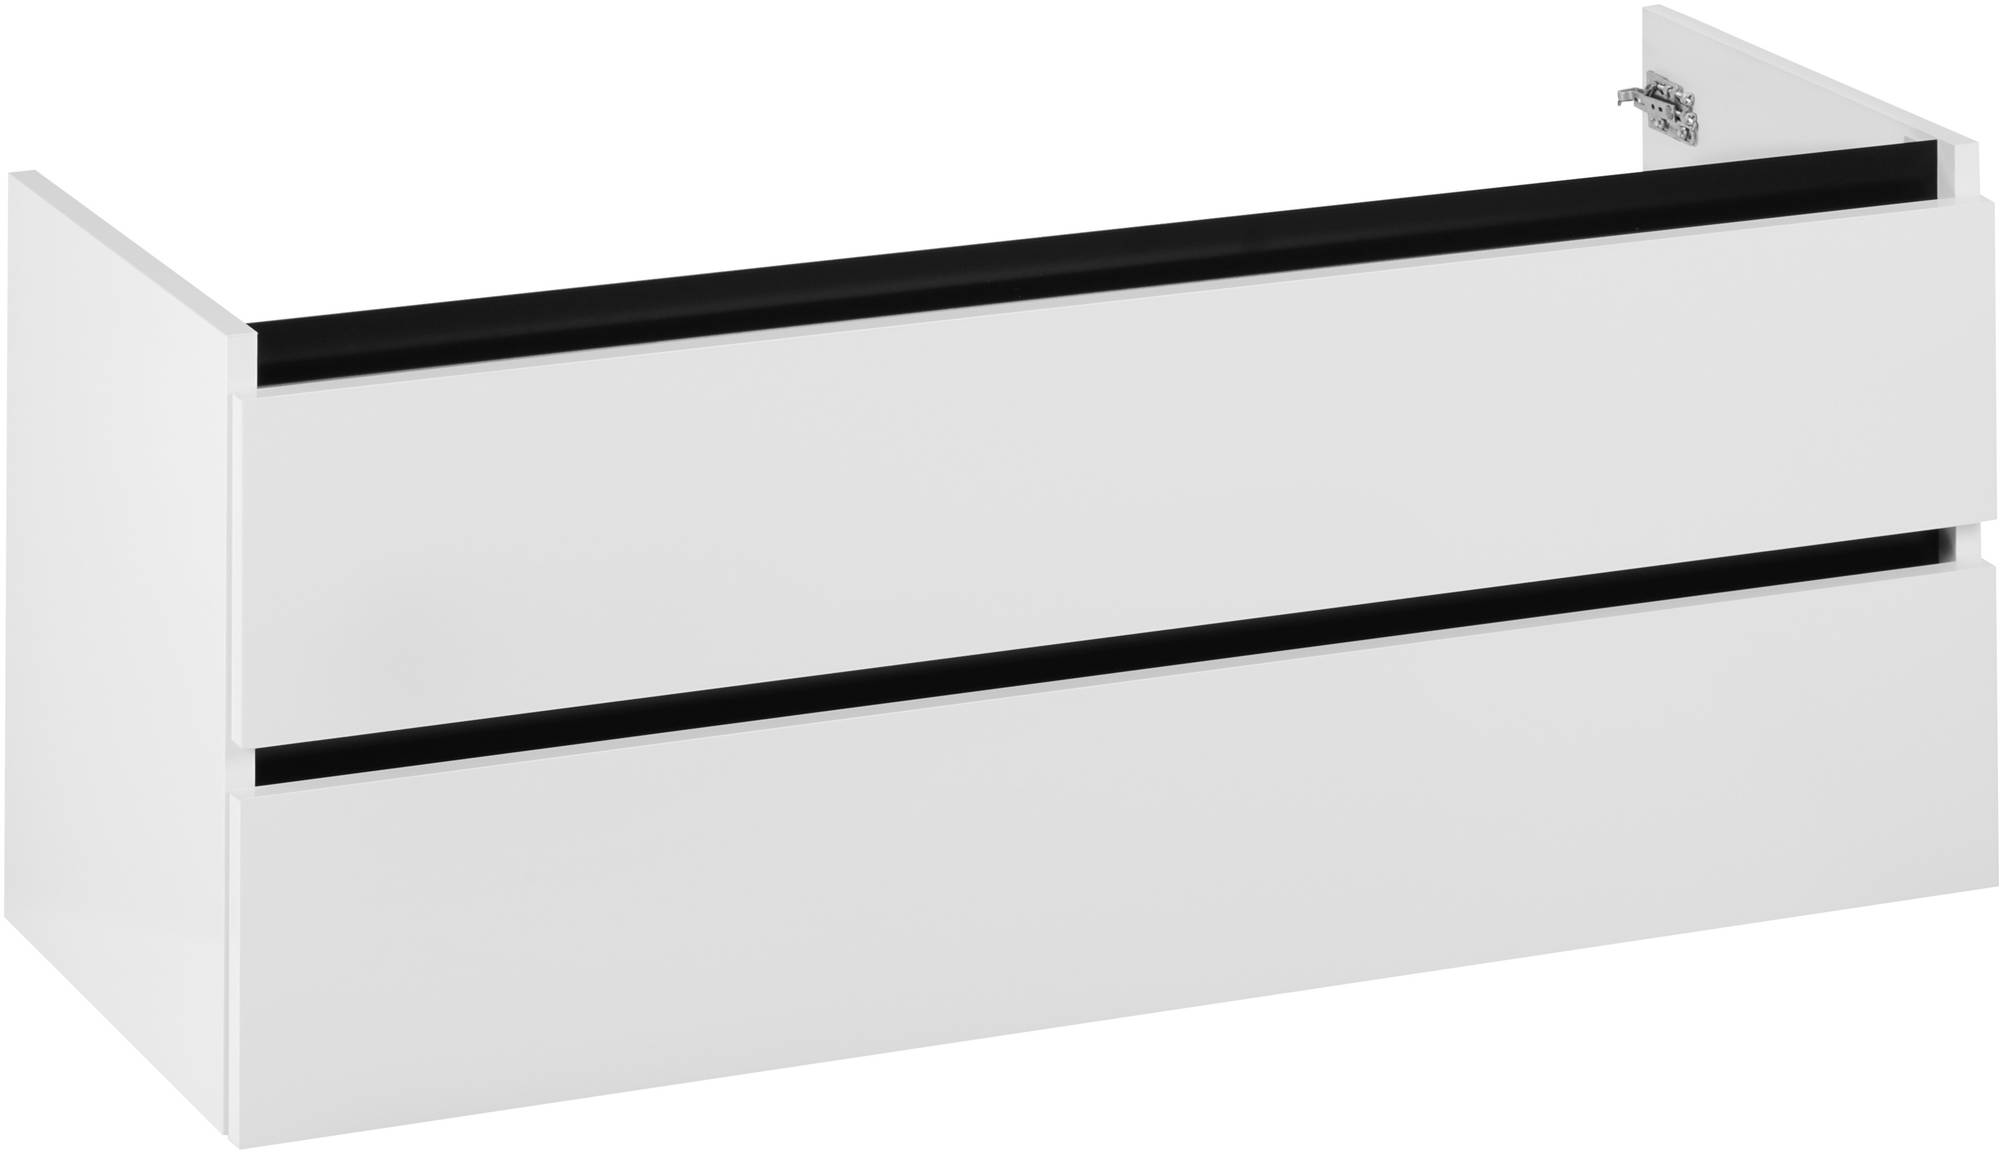 Ben Limara Wastafelonderkast 120x44,5x50cm Glans Wit/Mat zwart